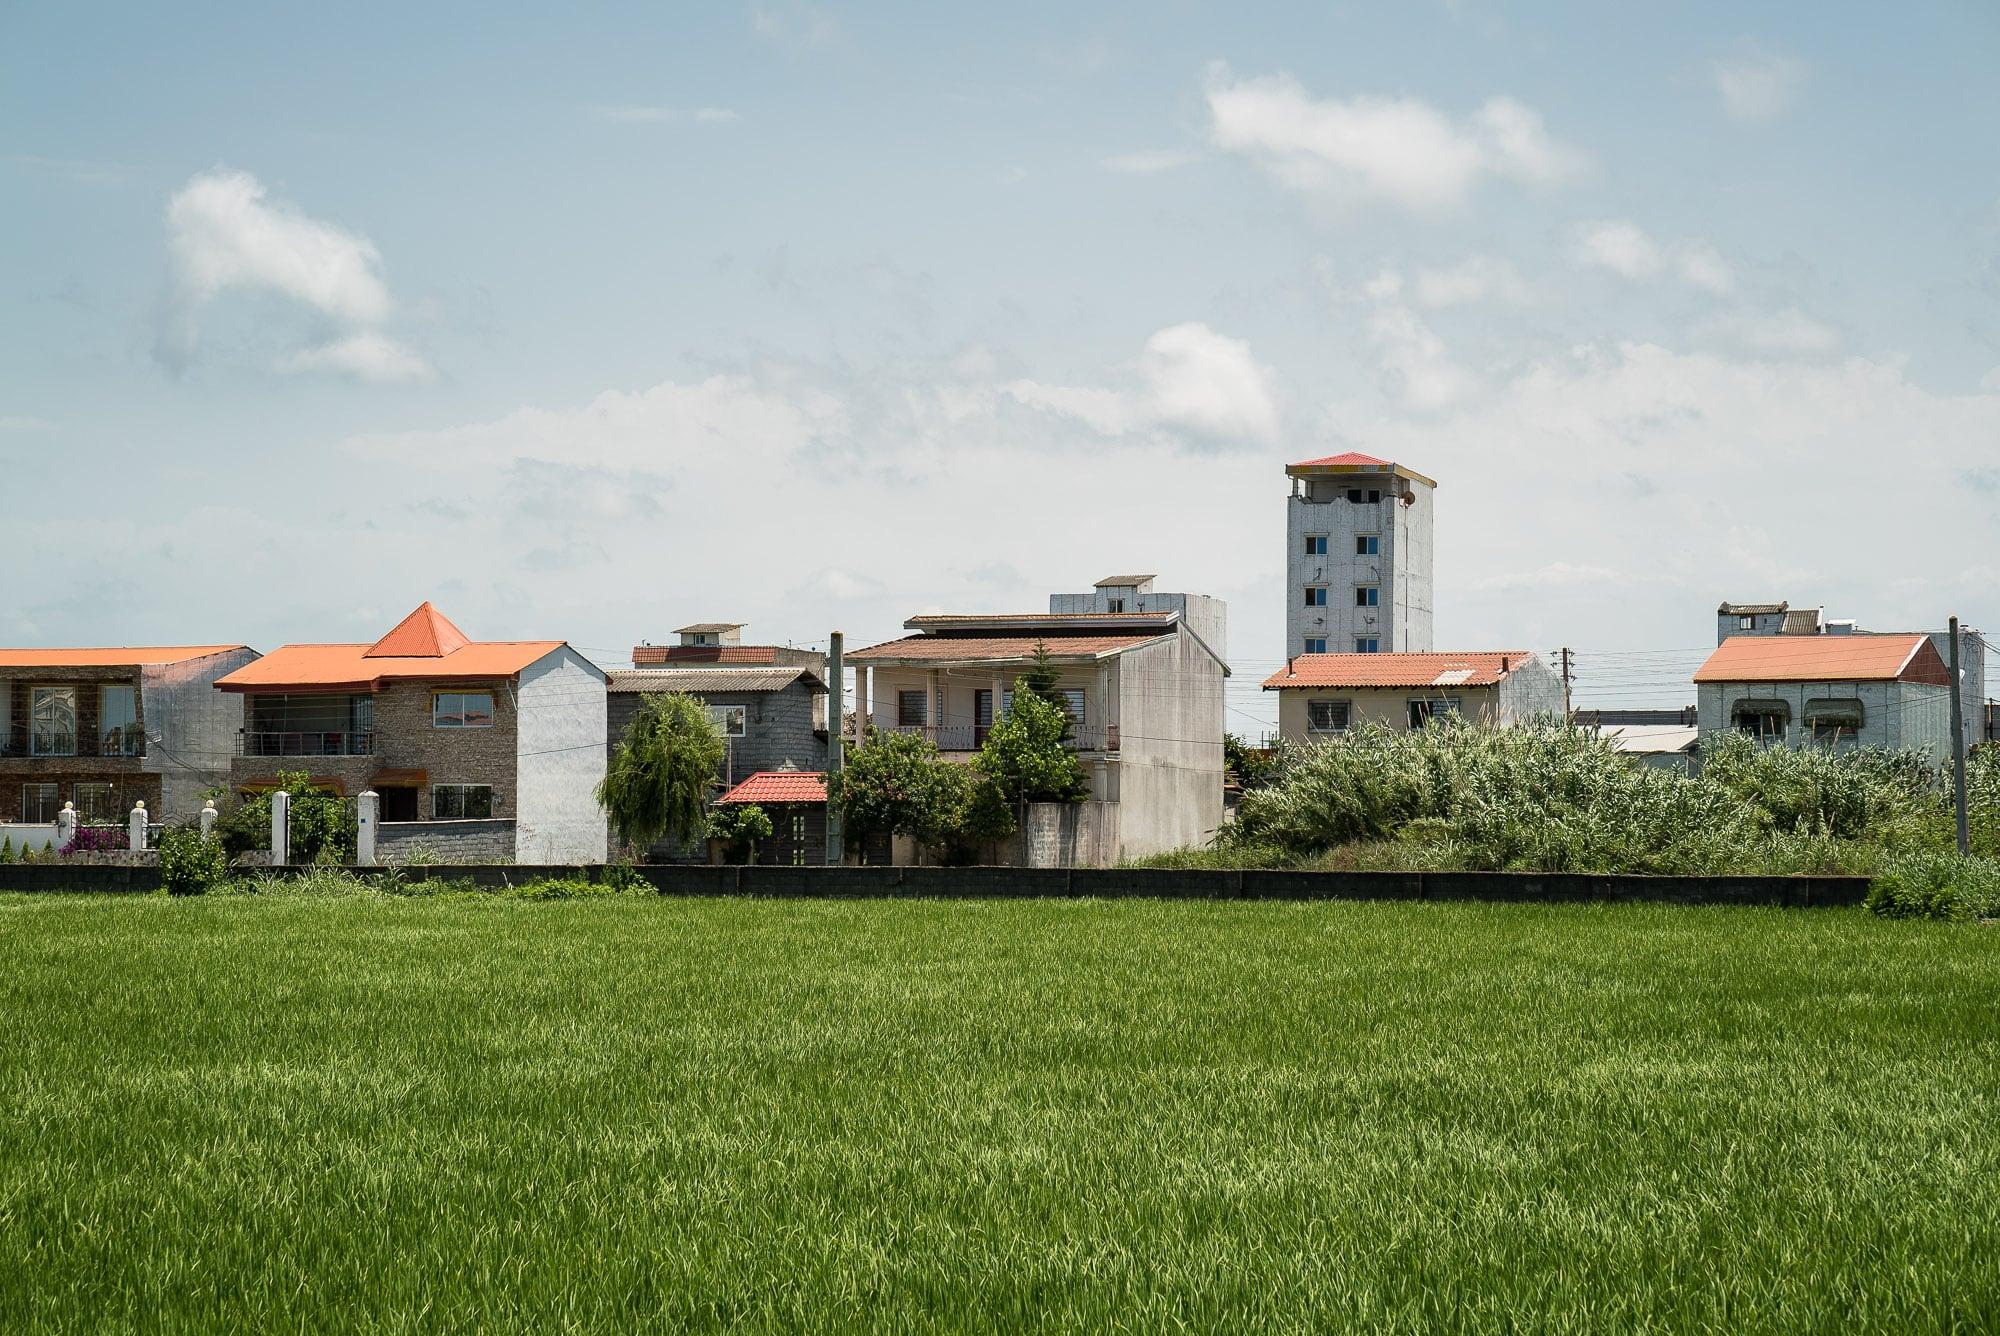 houses on the Caspian Sea coast